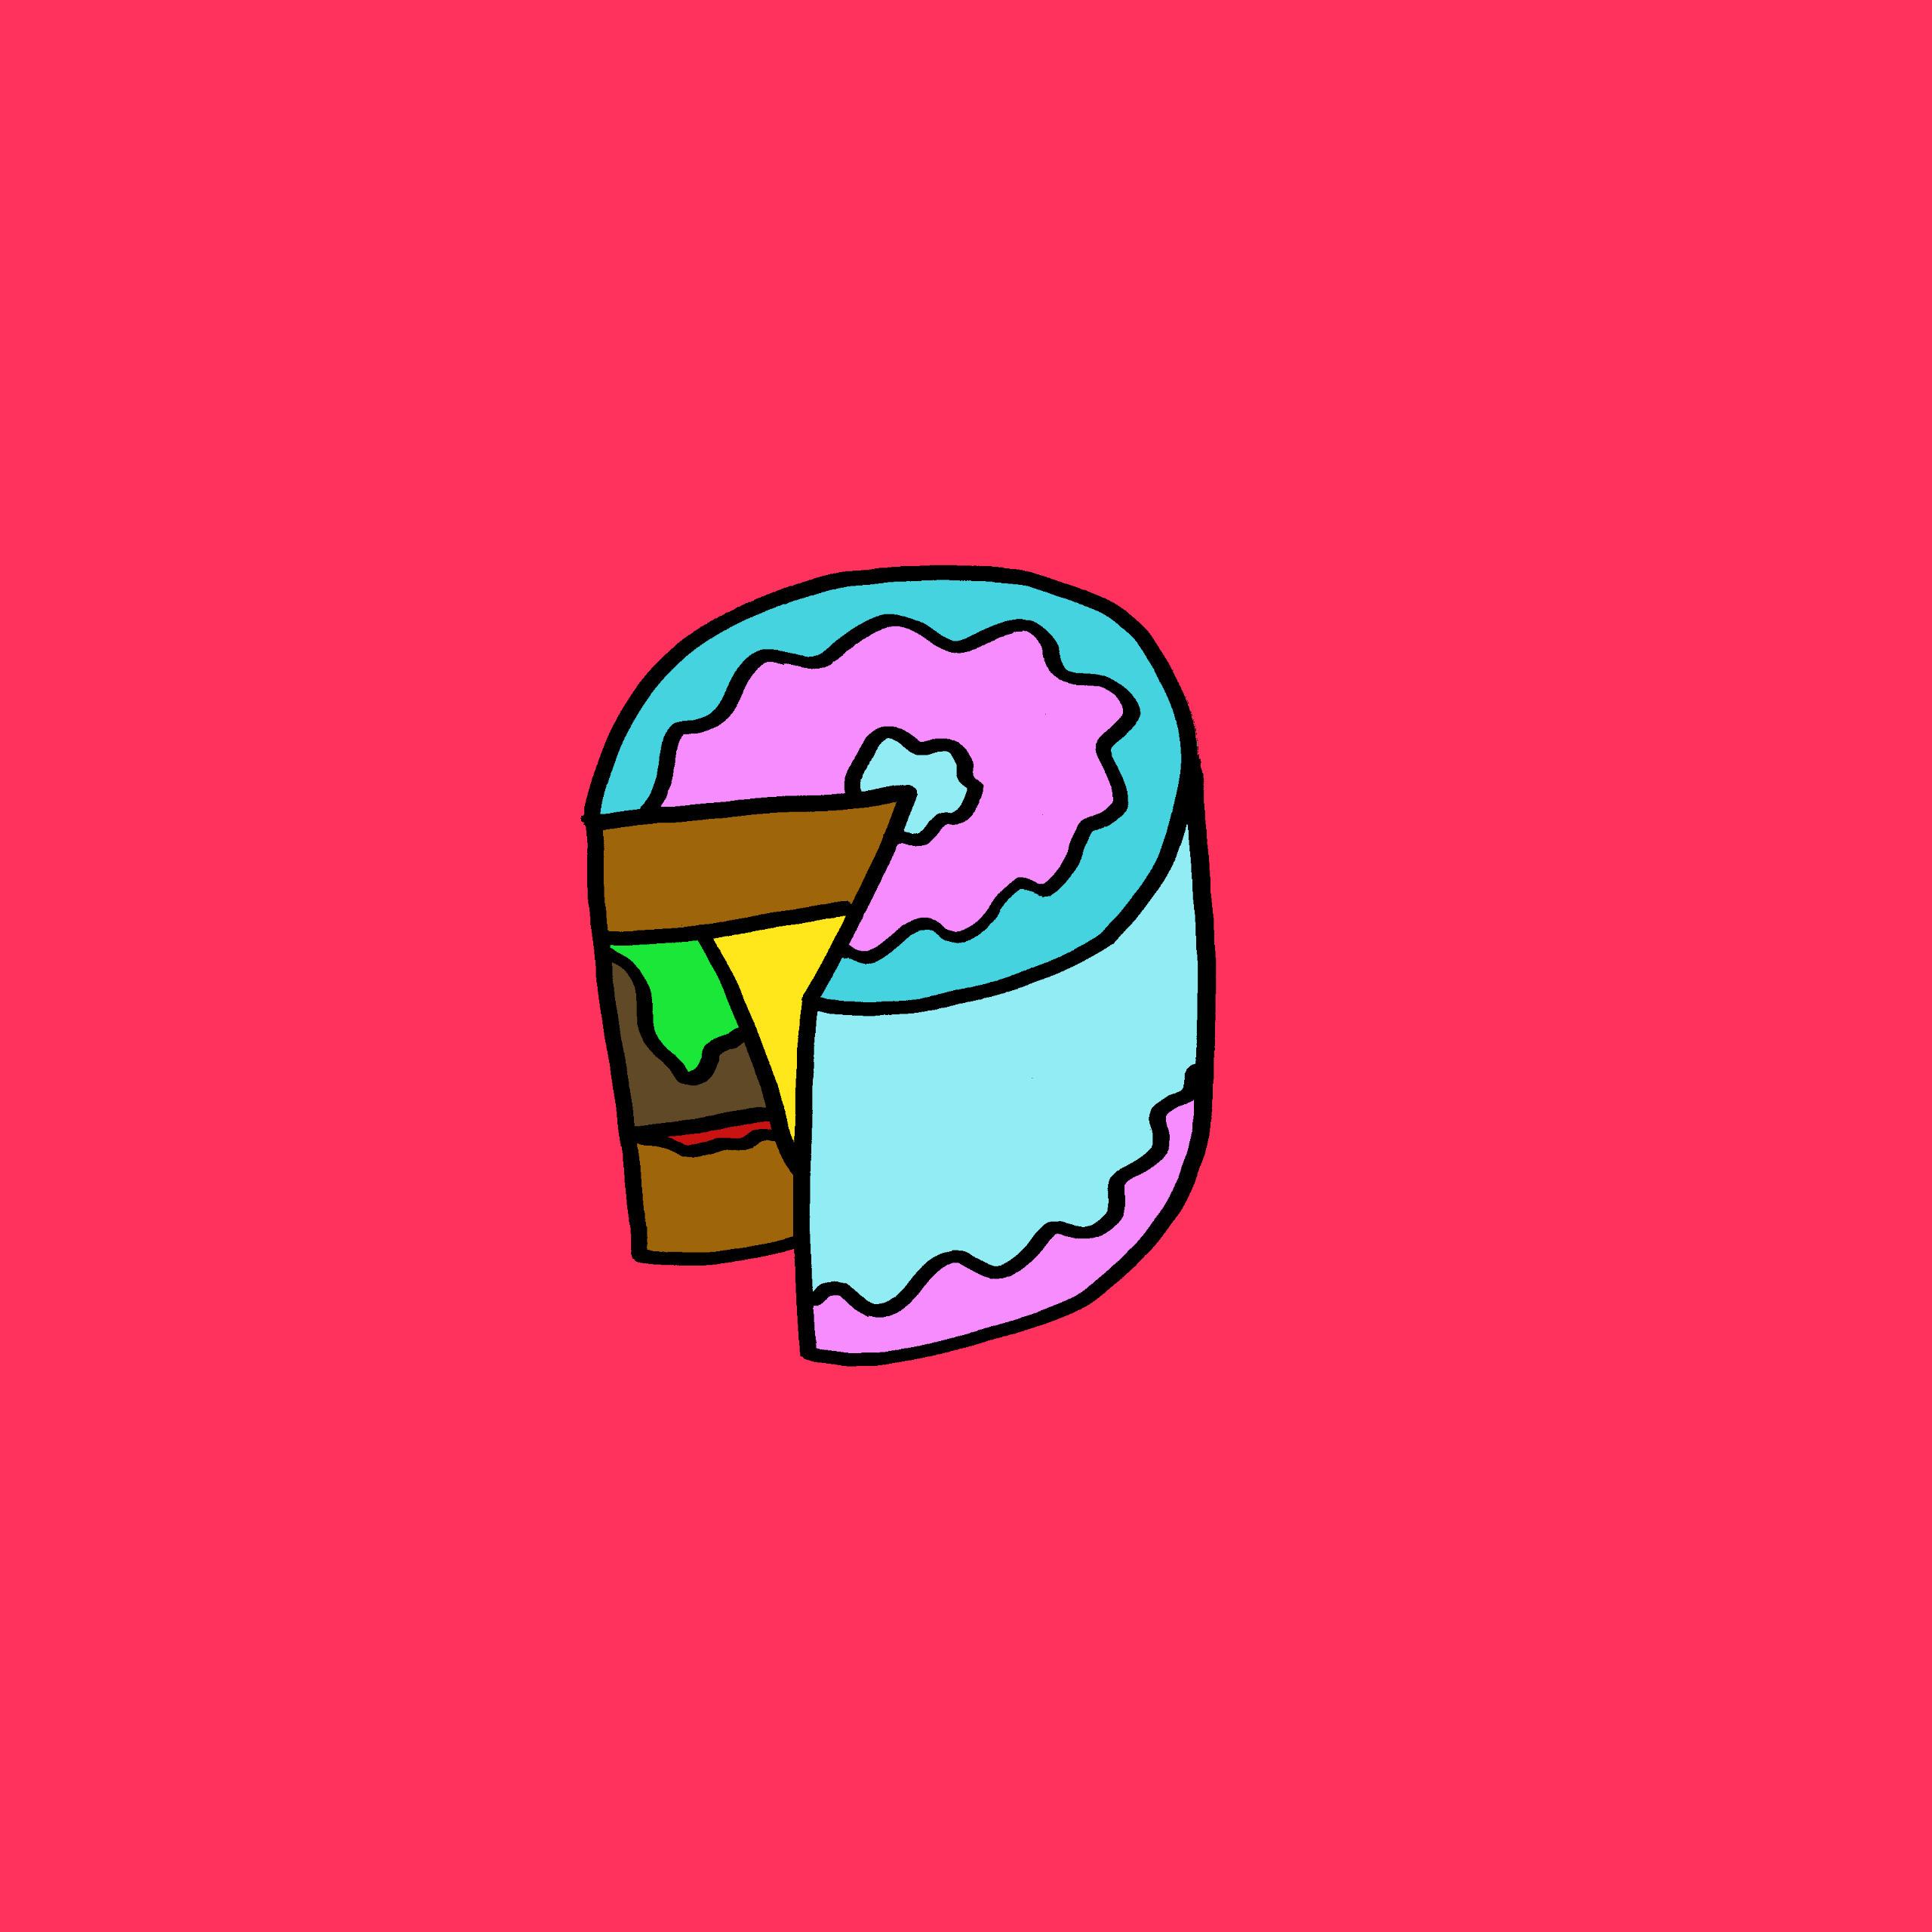 Burger Cake - kingporteous | ello